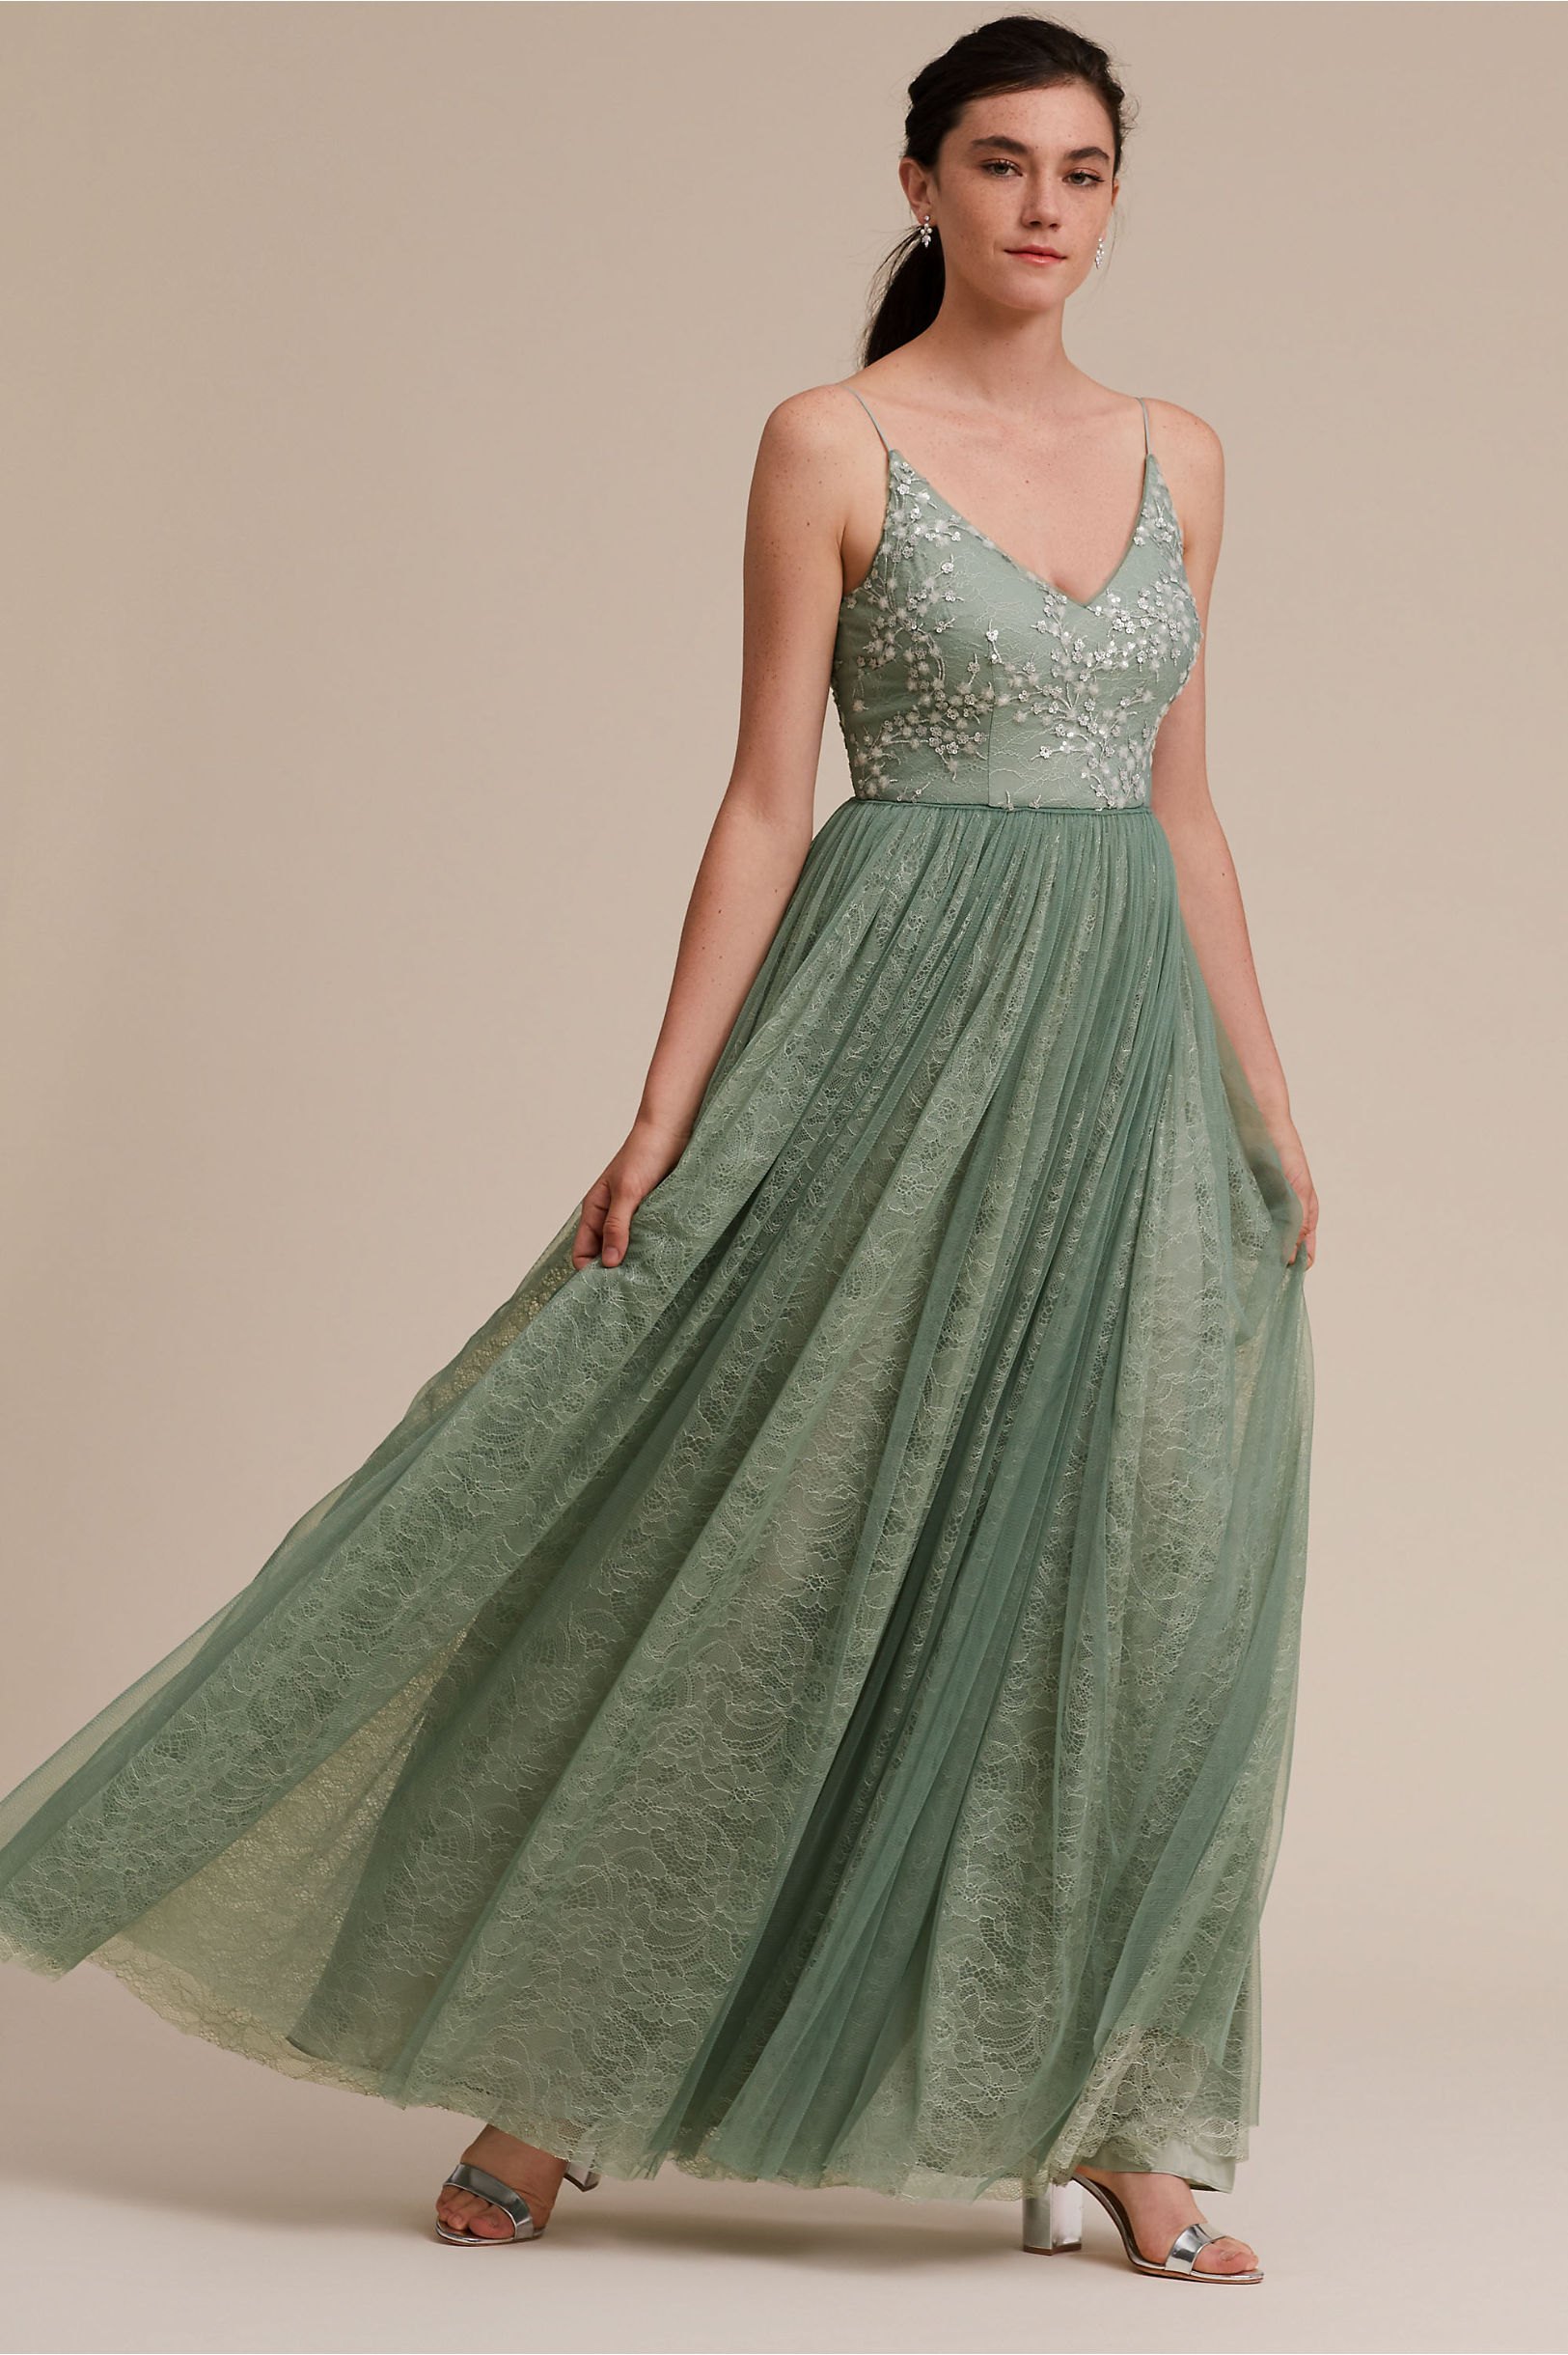 Cluny Dress Aqua Mist in Sale | BHLDN